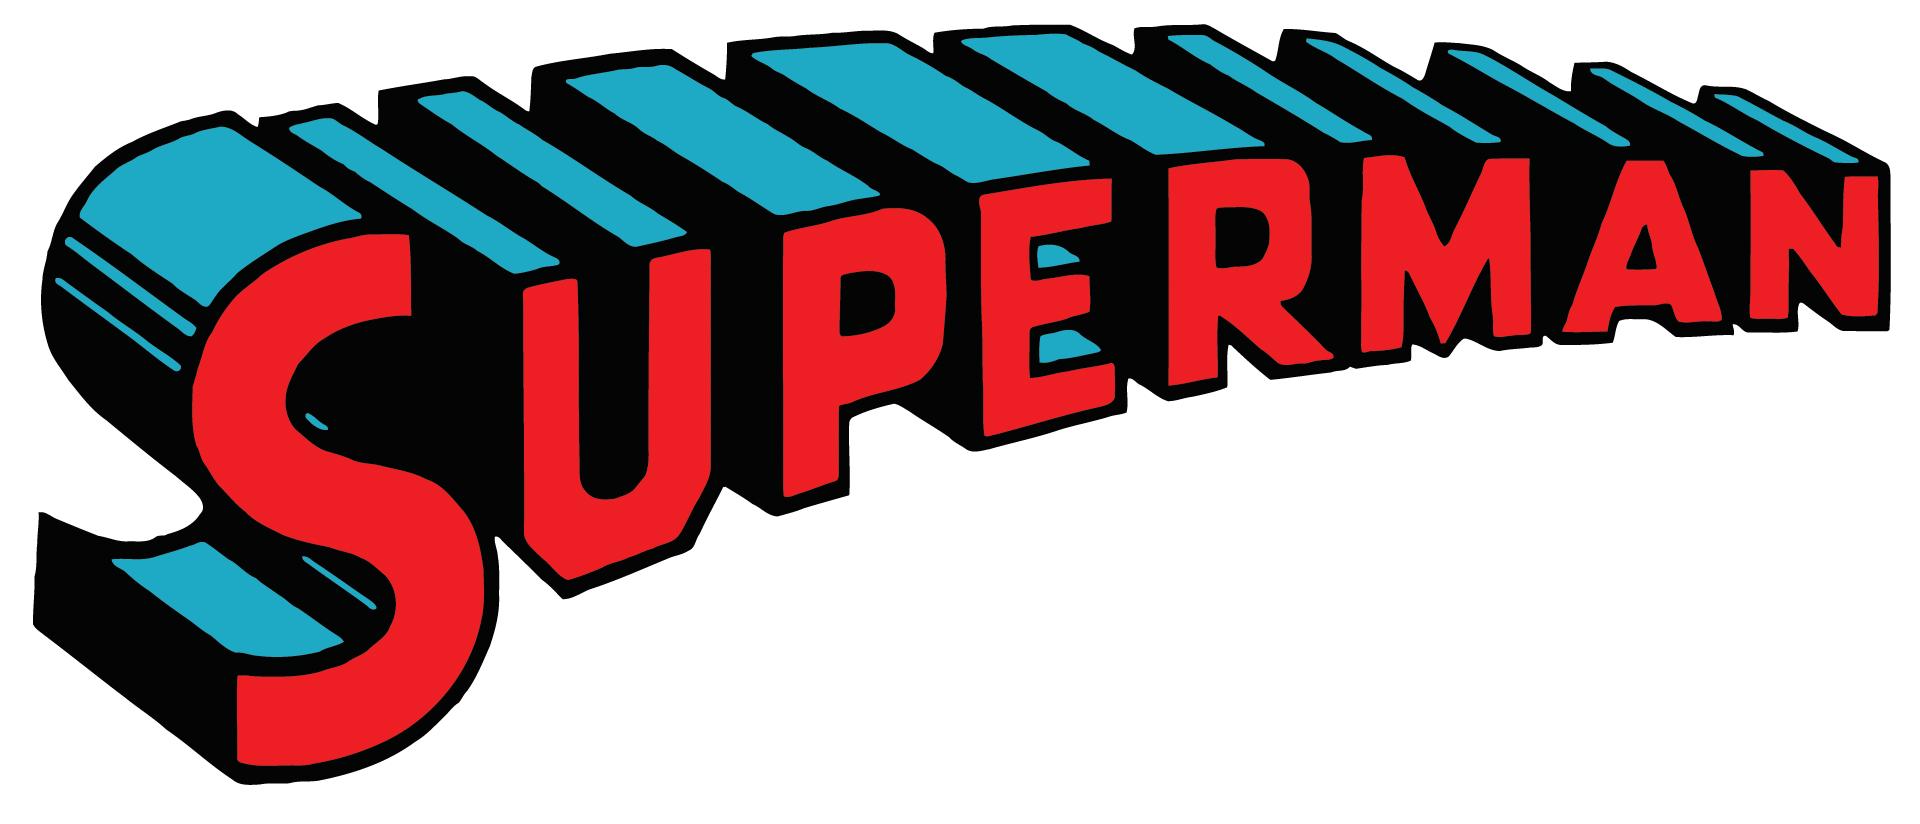 superman logo by benokil - photo #46